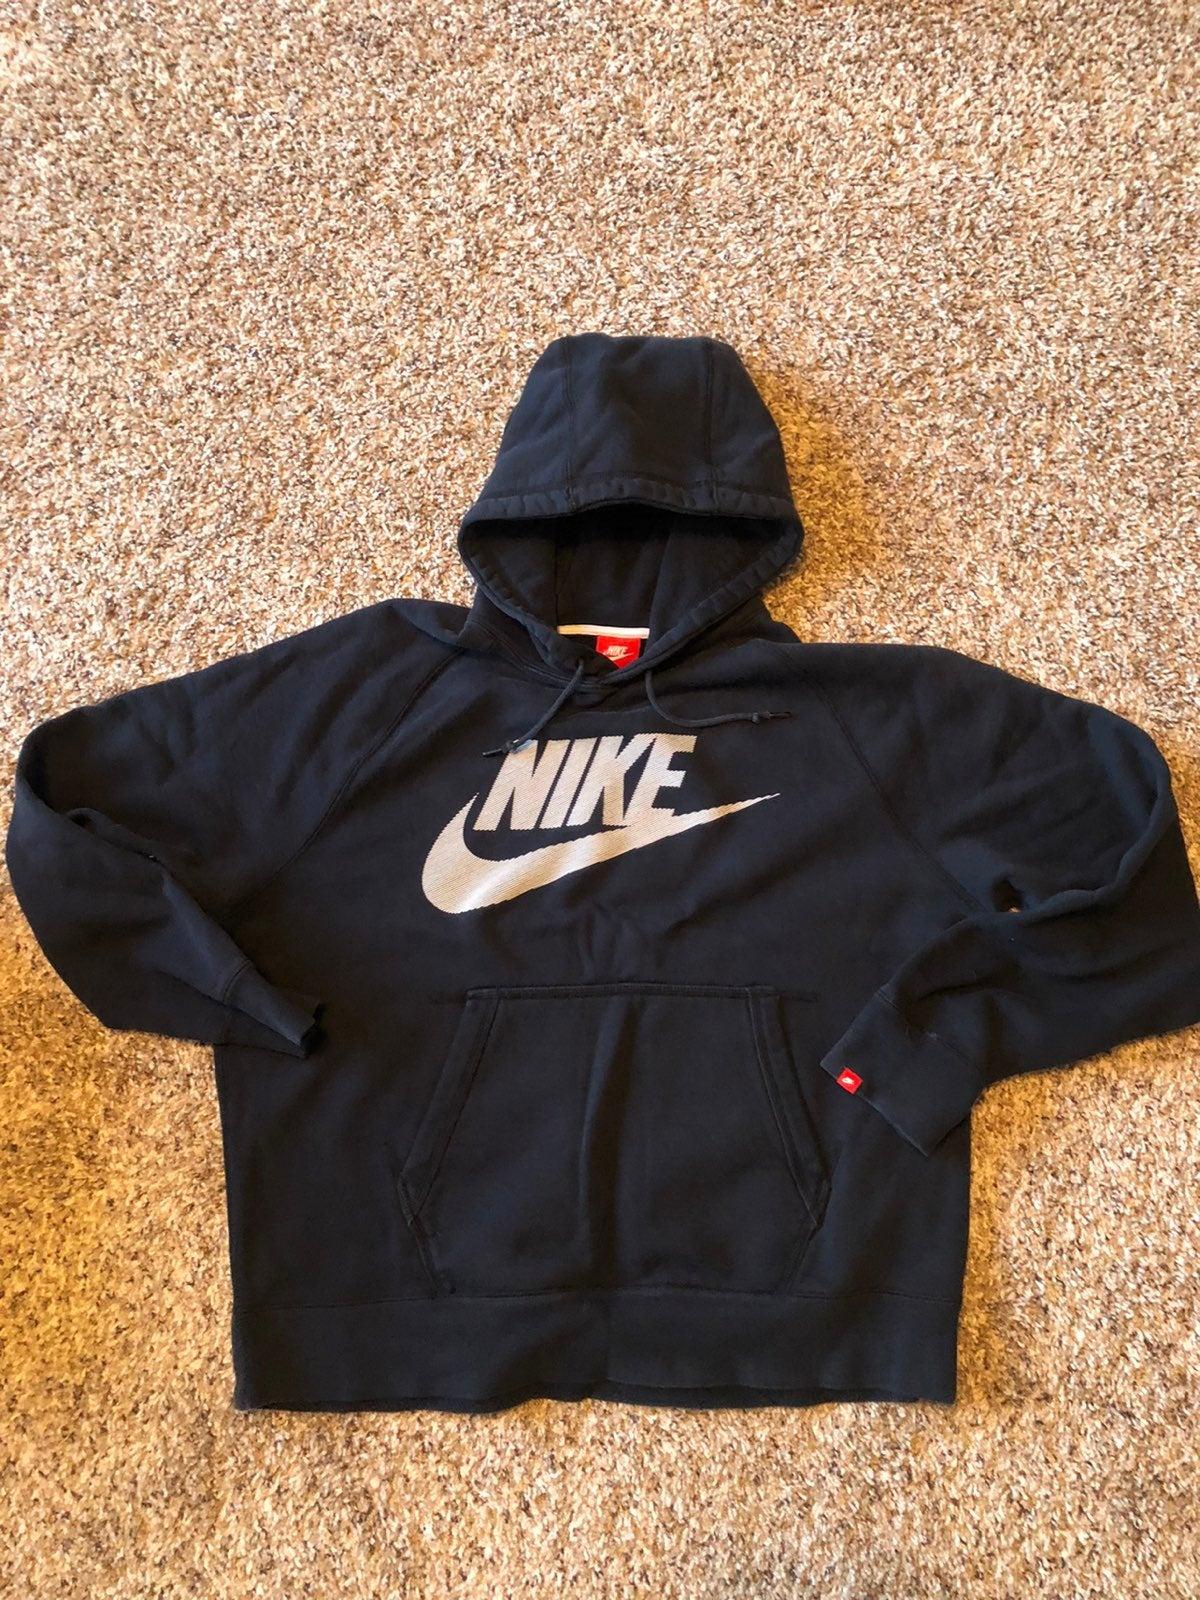 Youth XL Nike Hoodie